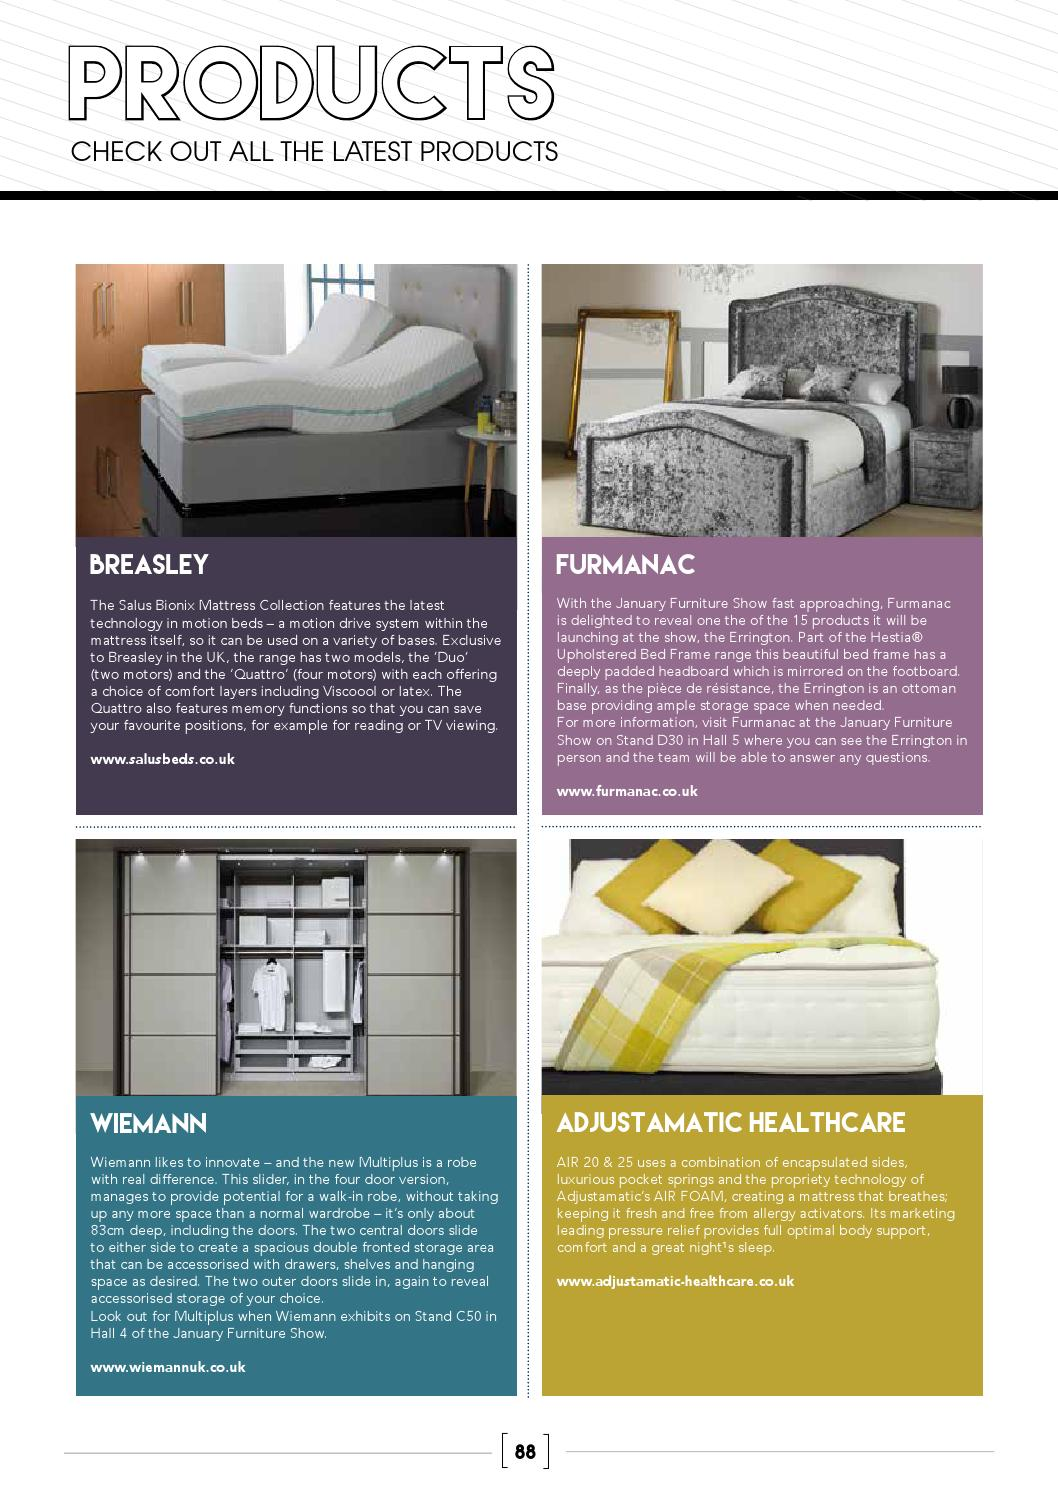 Phenomenal Beds Magazine January 2016 By Cabinet Maker Issuu Inzonedesignstudio Interior Chair Design Inzonedesignstudiocom